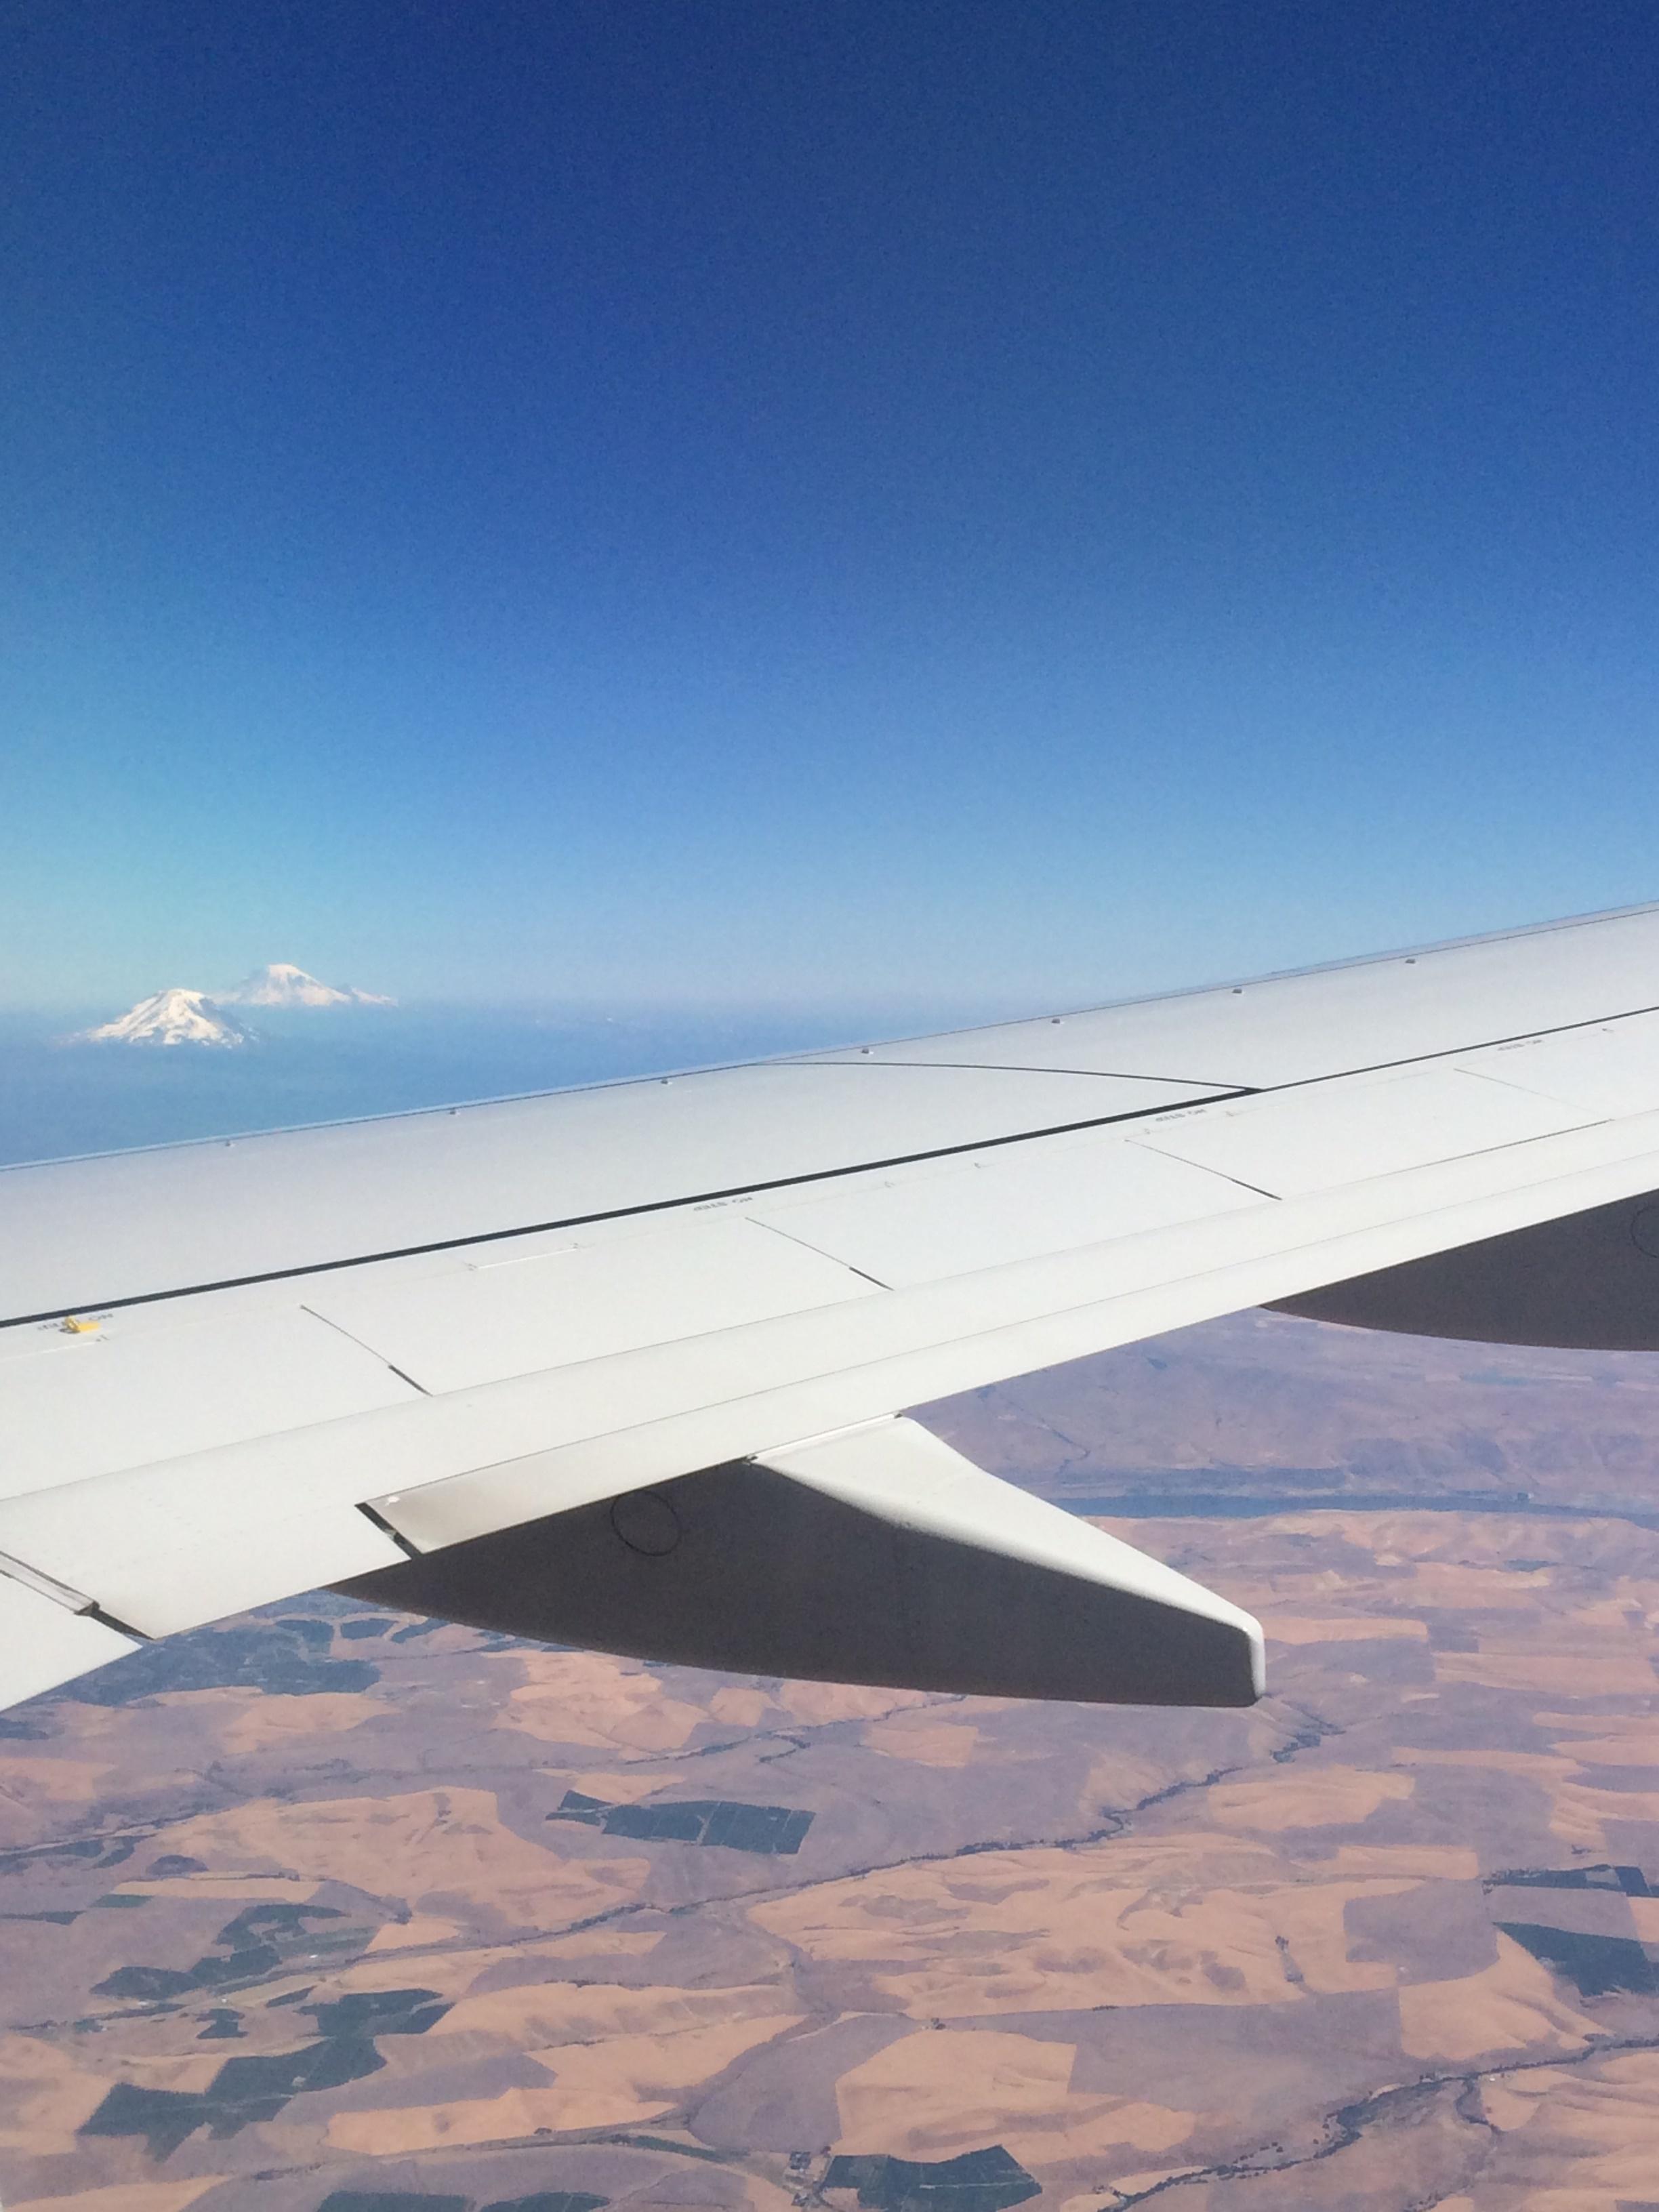 En route to Portland